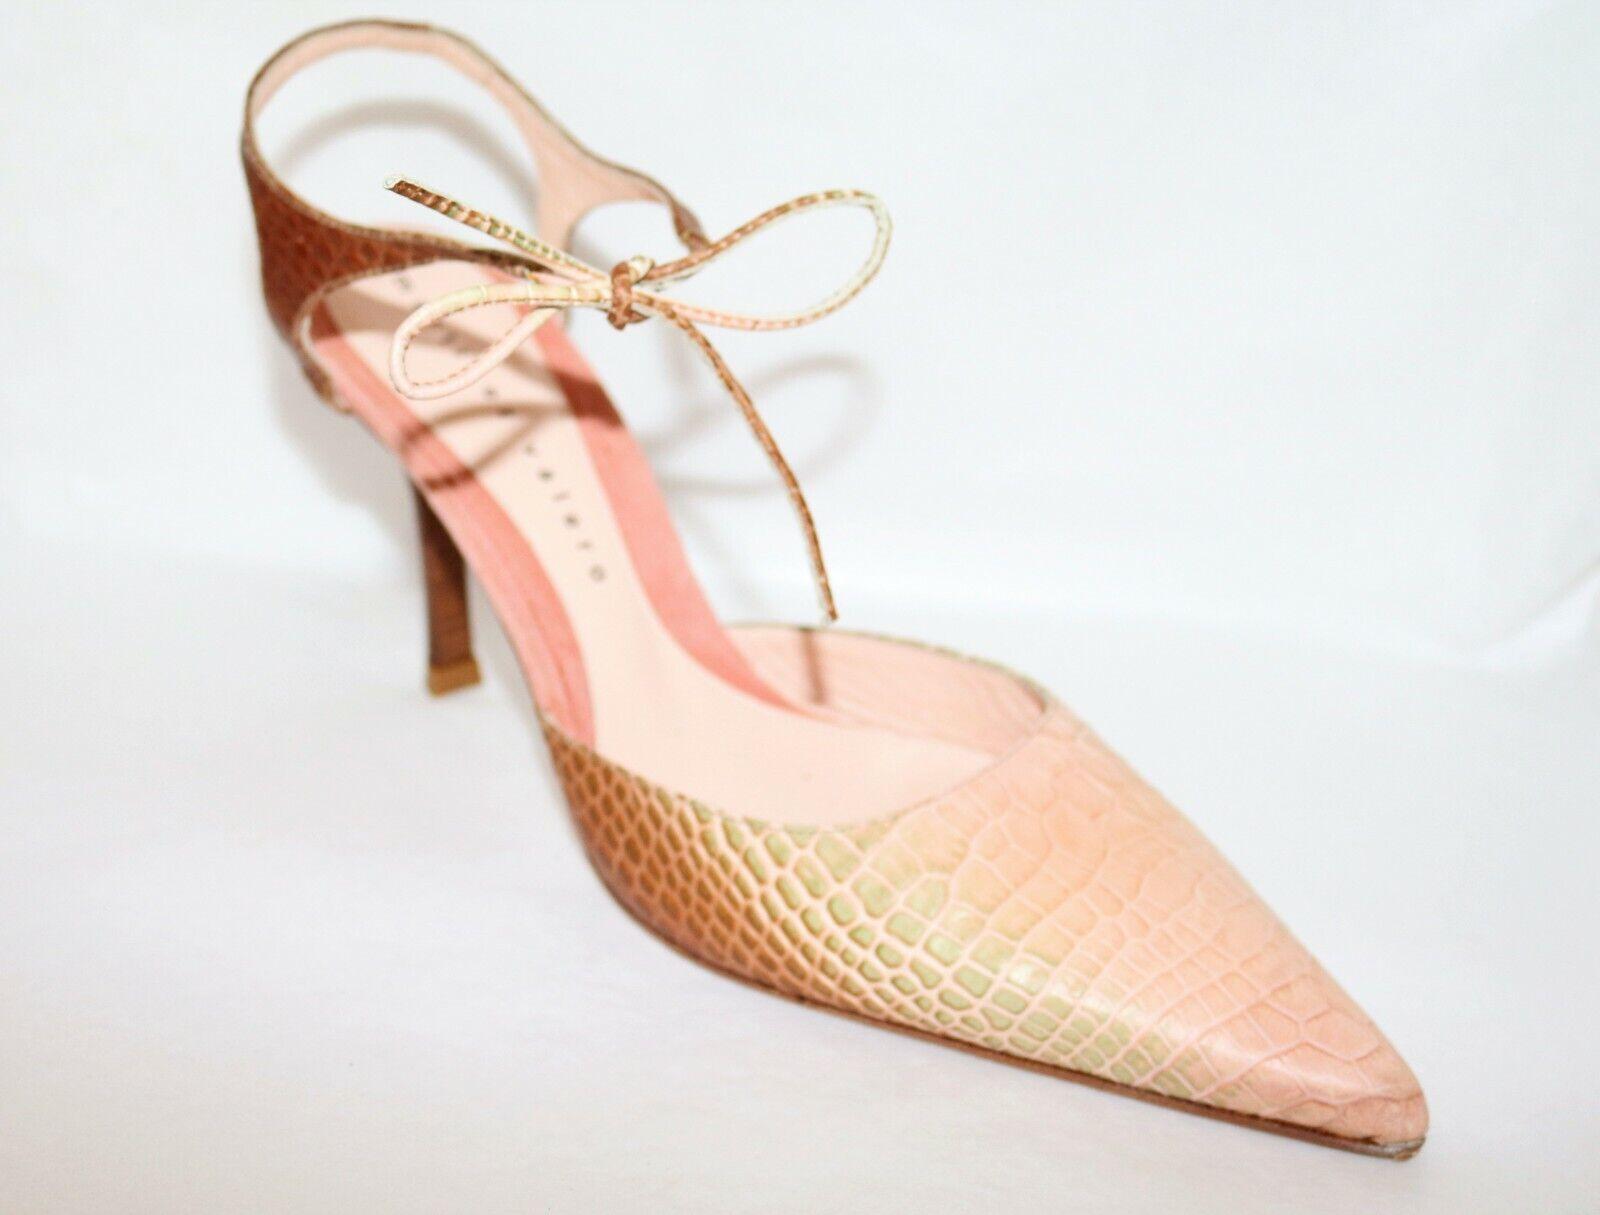 Martinez Valero Brand Creams Reptile Print Leather Pointed Heels Dimensione 39.5 NEW